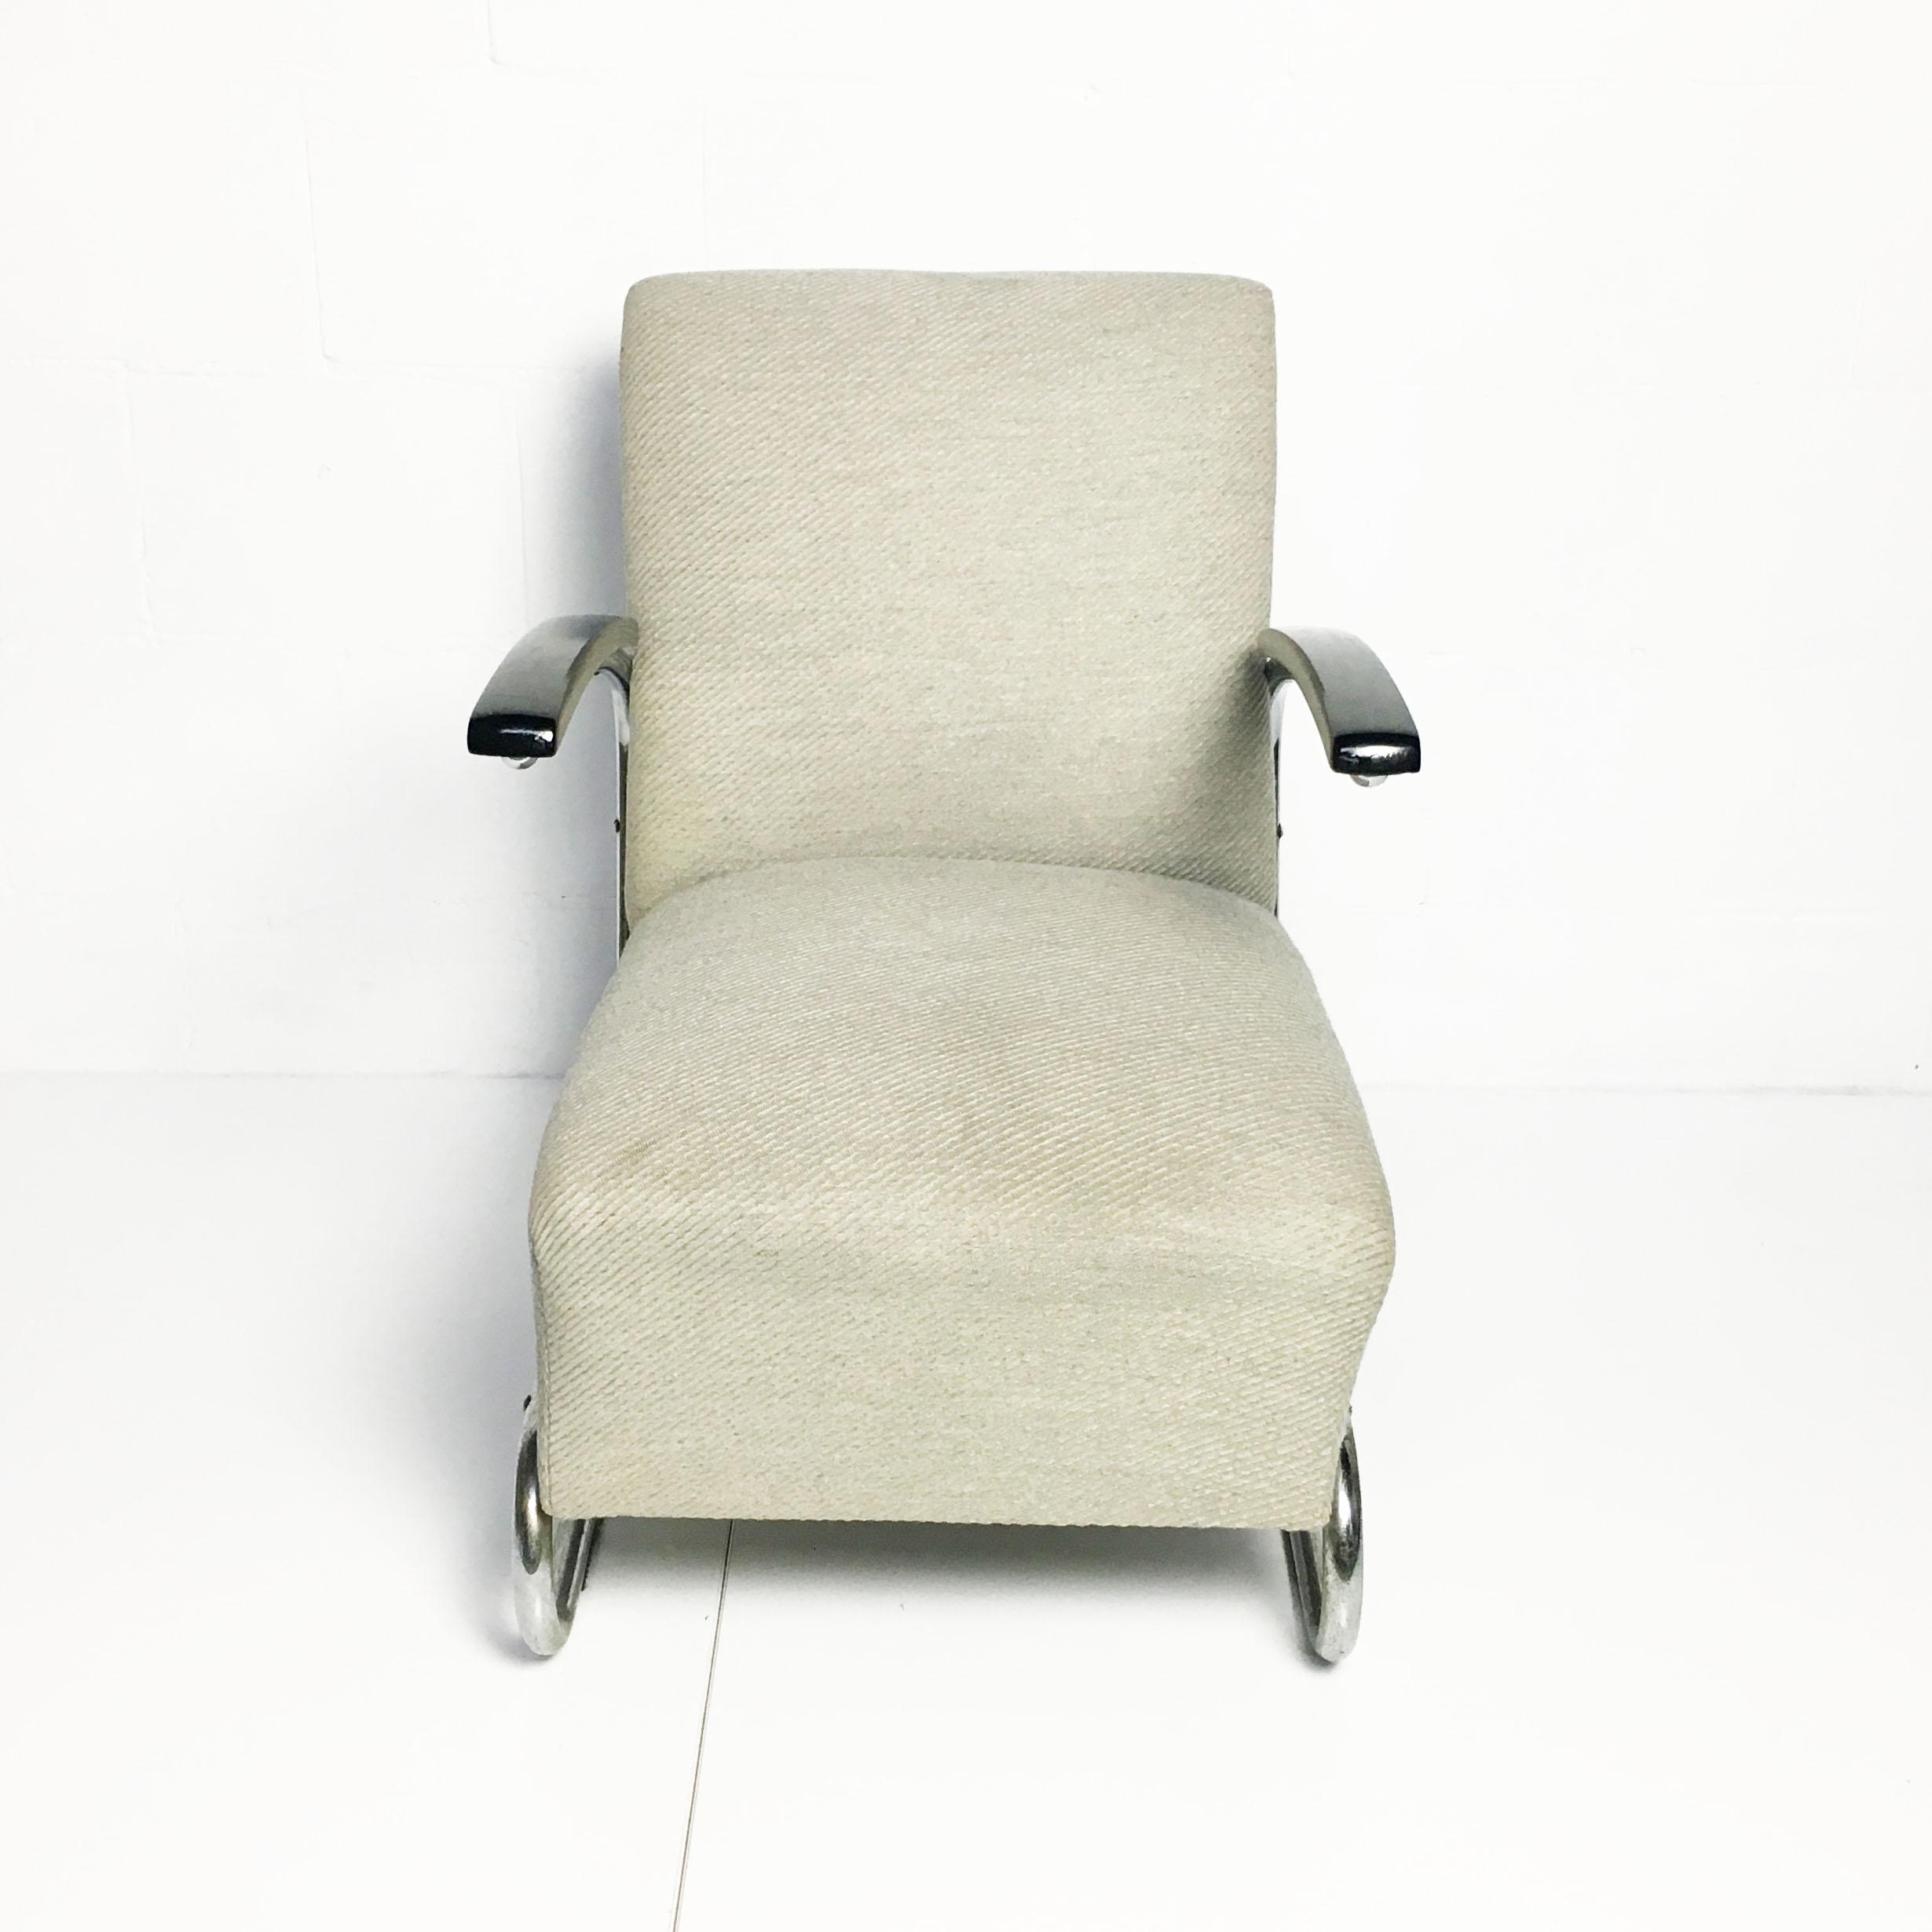 vintage thonet s411 fauteuil bureau baantjer. Black Bedroom Furniture Sets. Home Design Ideas